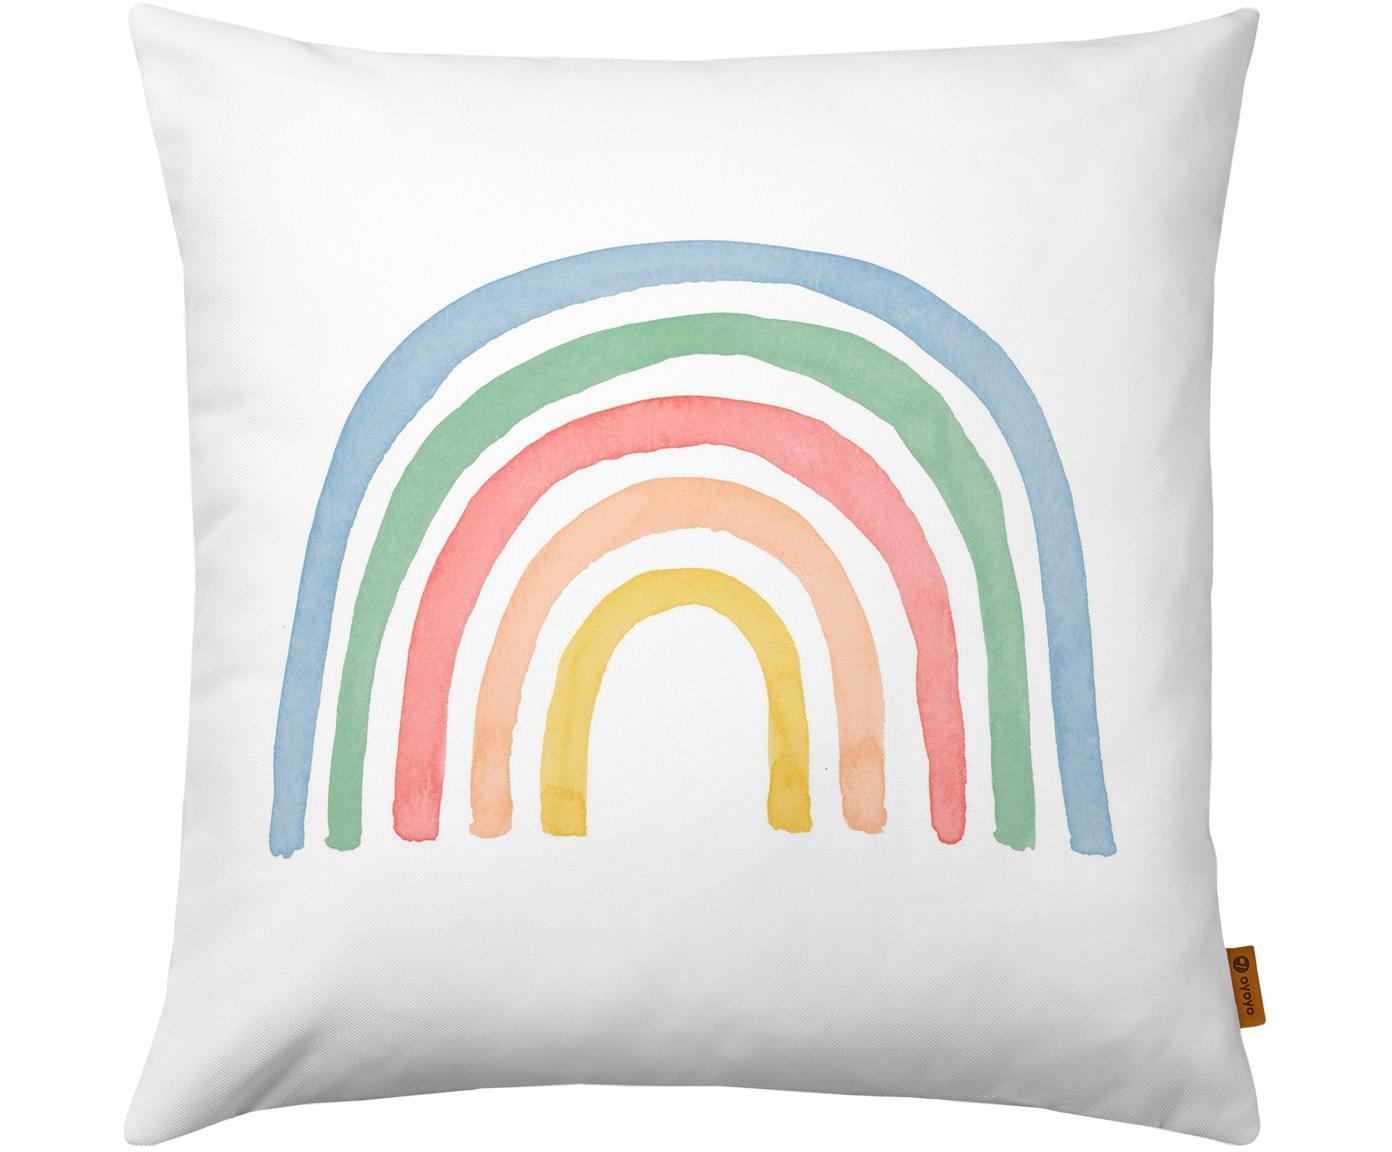 Kussenhoes Rainbow, Katoen, Wit, multicolour, 40 x 40 cm